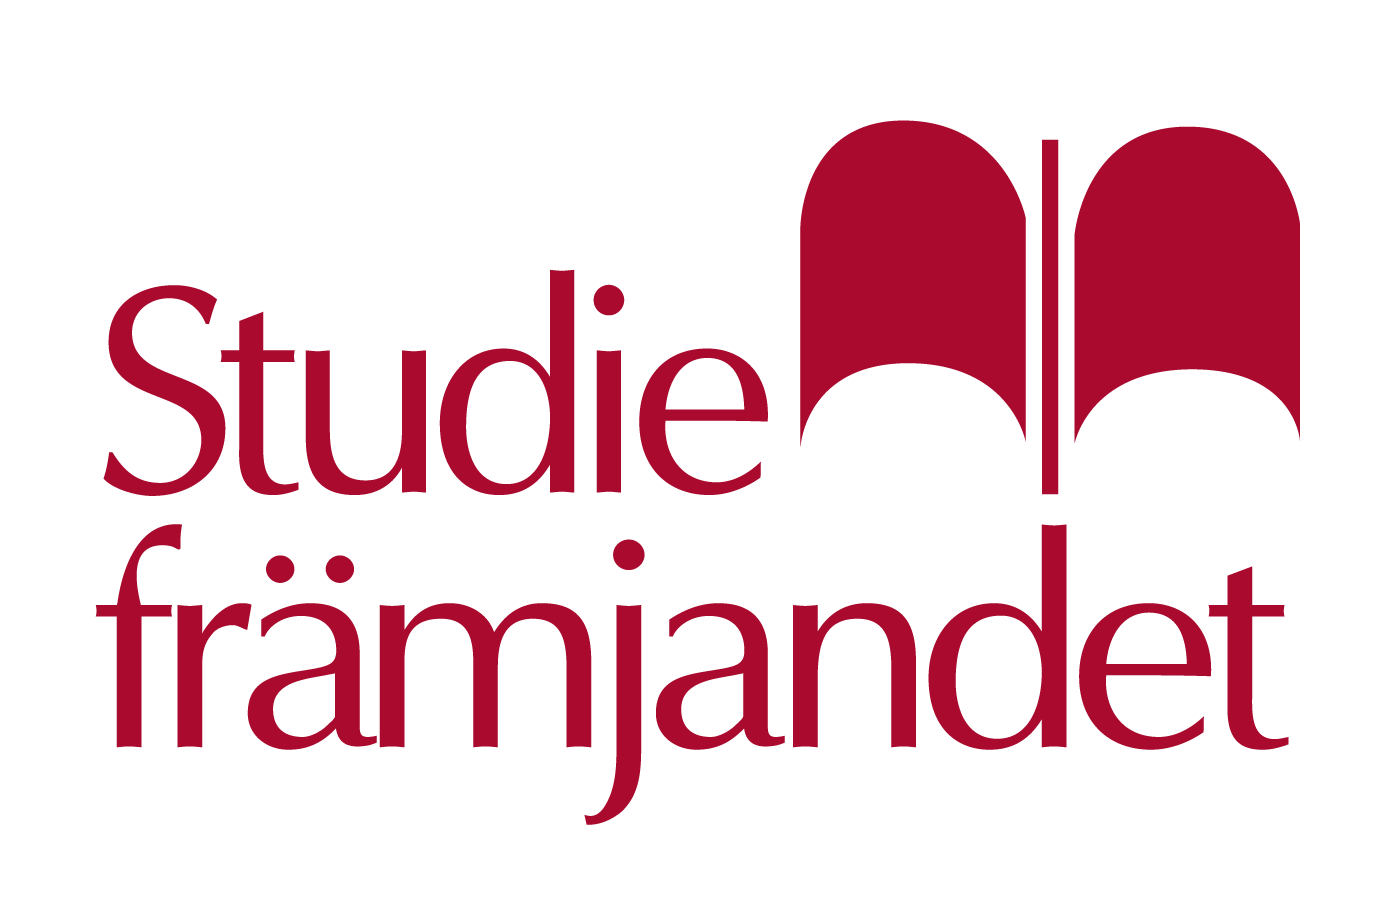 Lunds Naturskyddsförening samarbetar med Studiefrämjandet